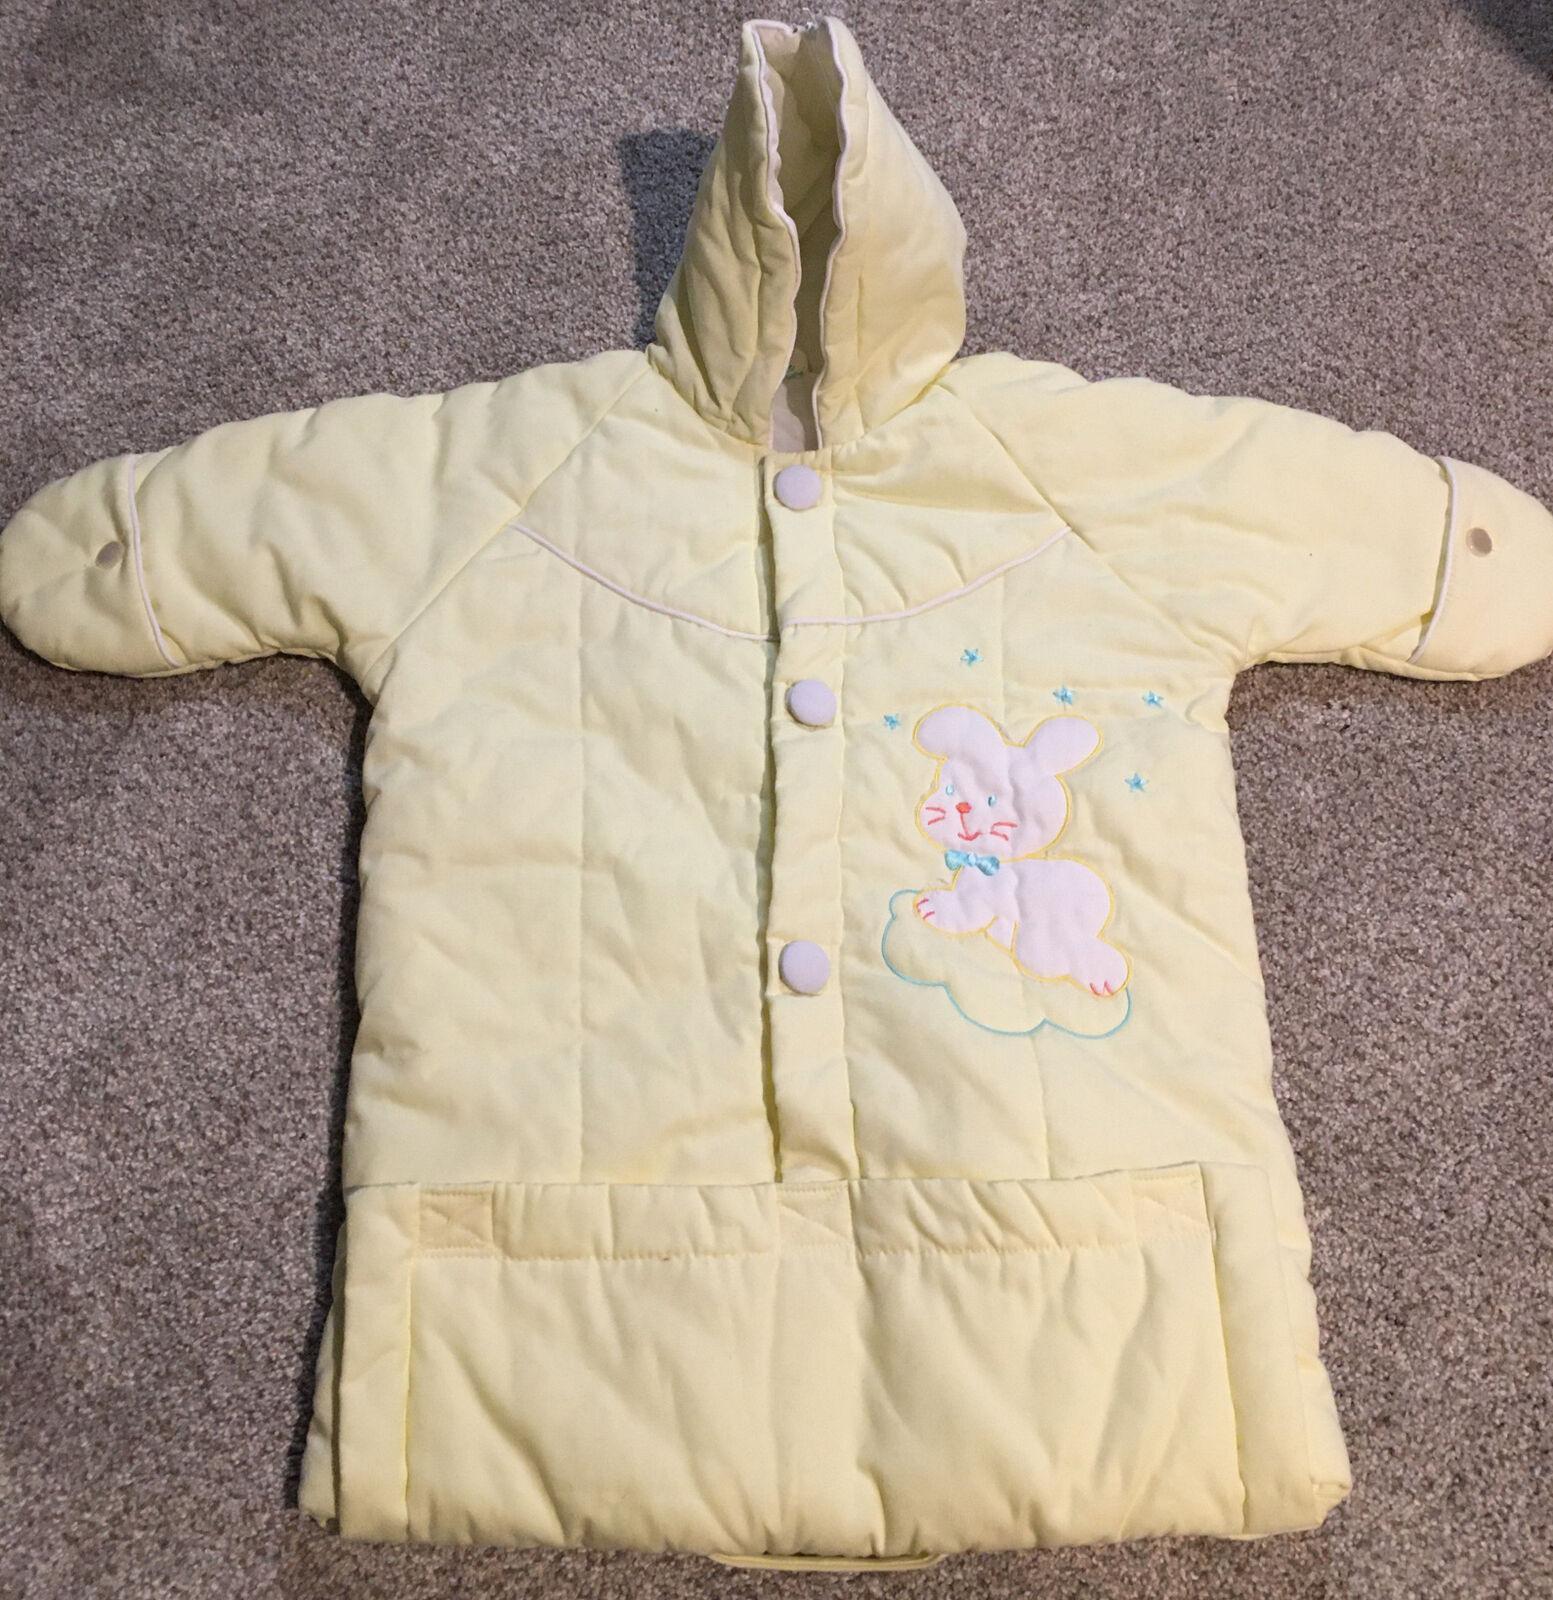 Children Babies Girls 12m-18m Light Pink Duck Dress Coat Pink Jacket Vintage 60s 70s